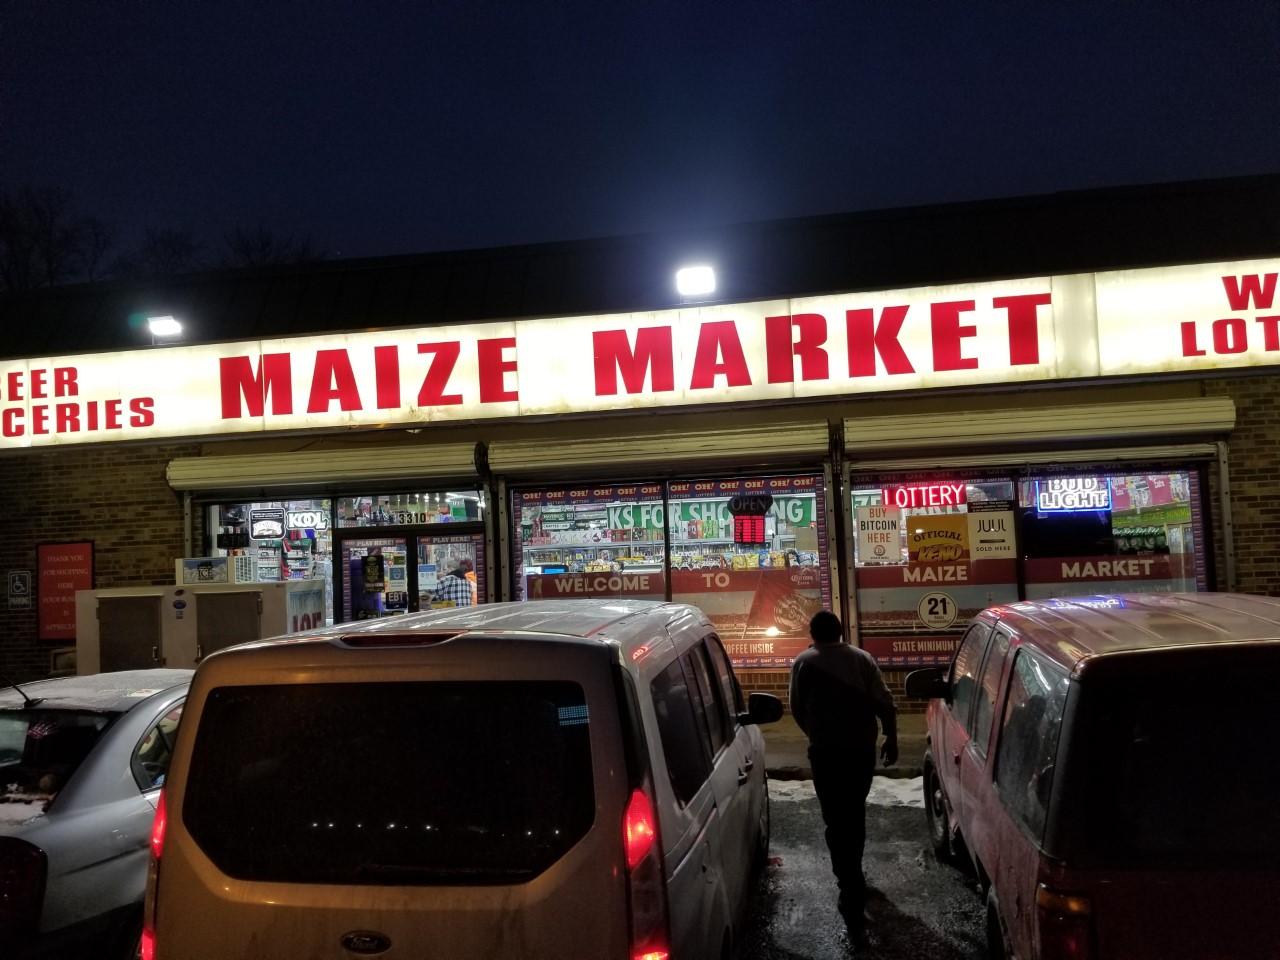 Maize Market